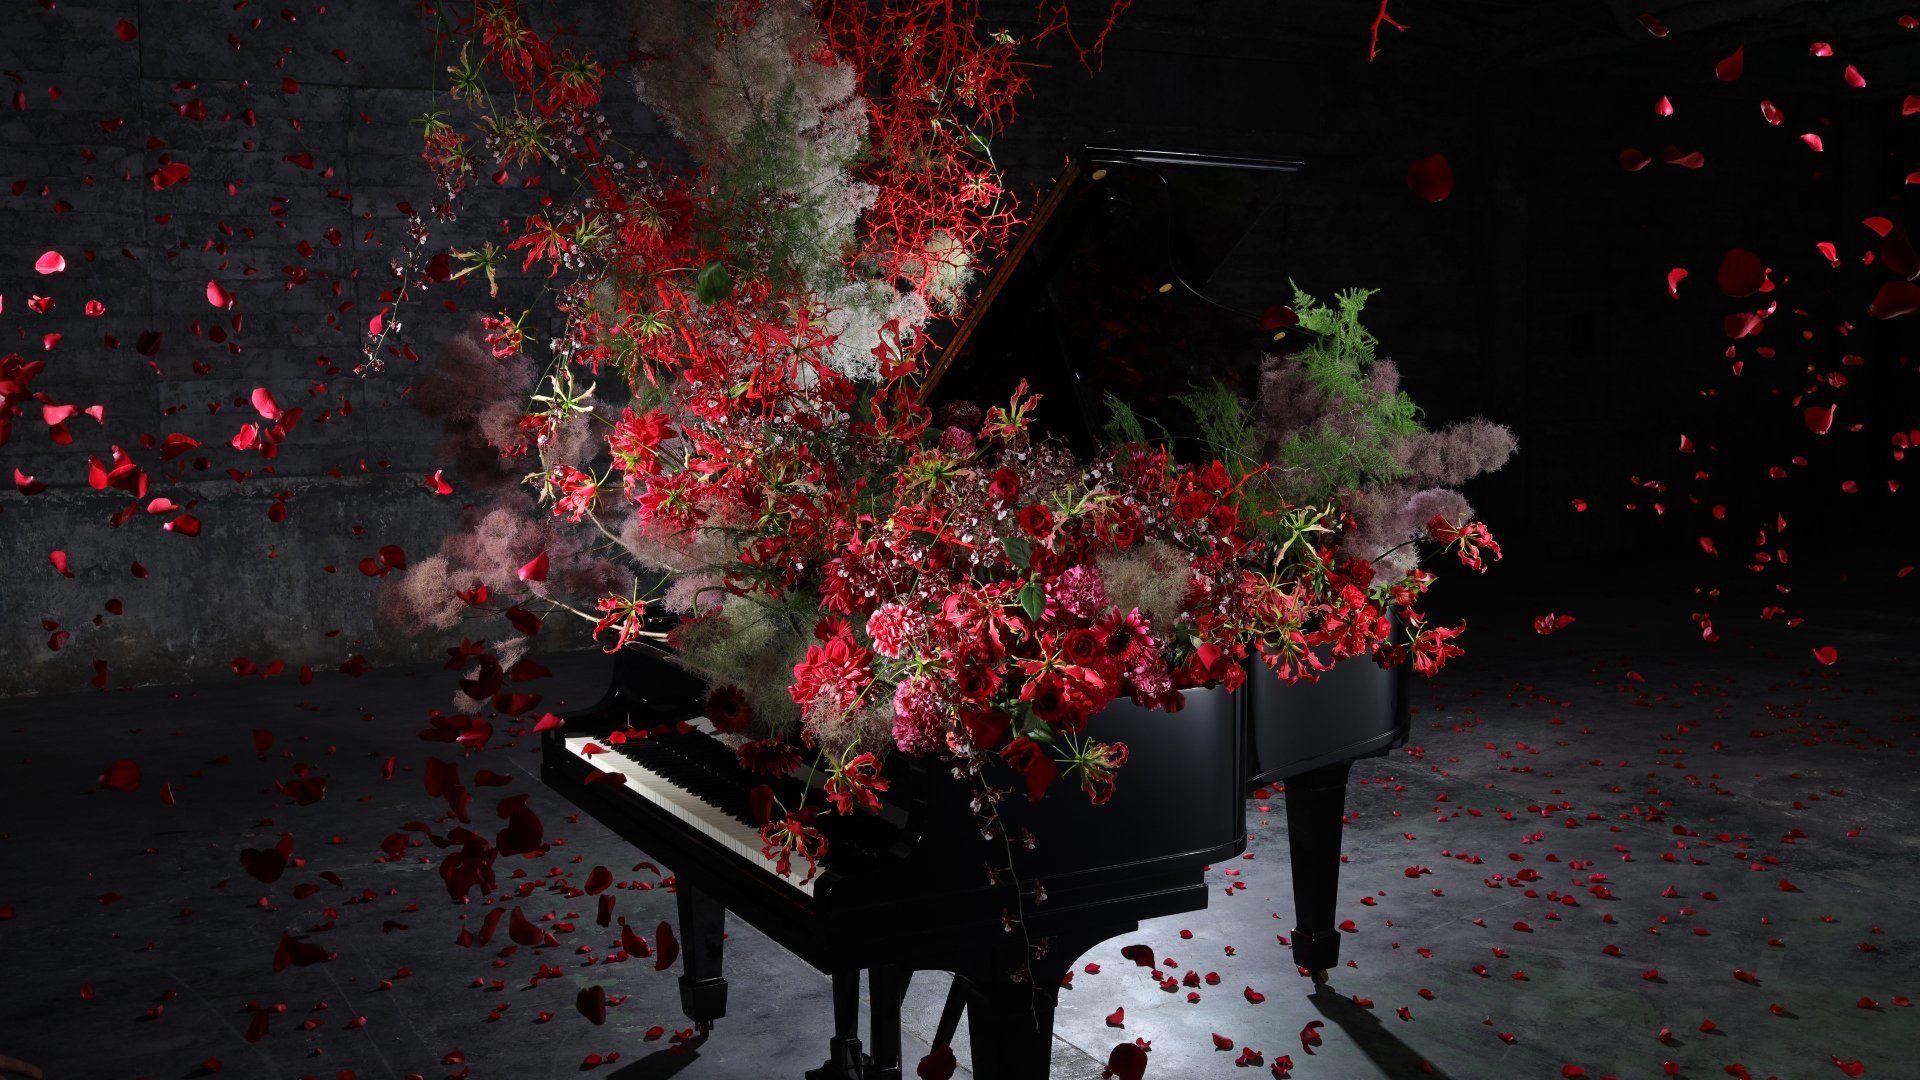 Flowers crashing ontop of piano low light no problem RF 35mm f/1.8 IS Macro STM